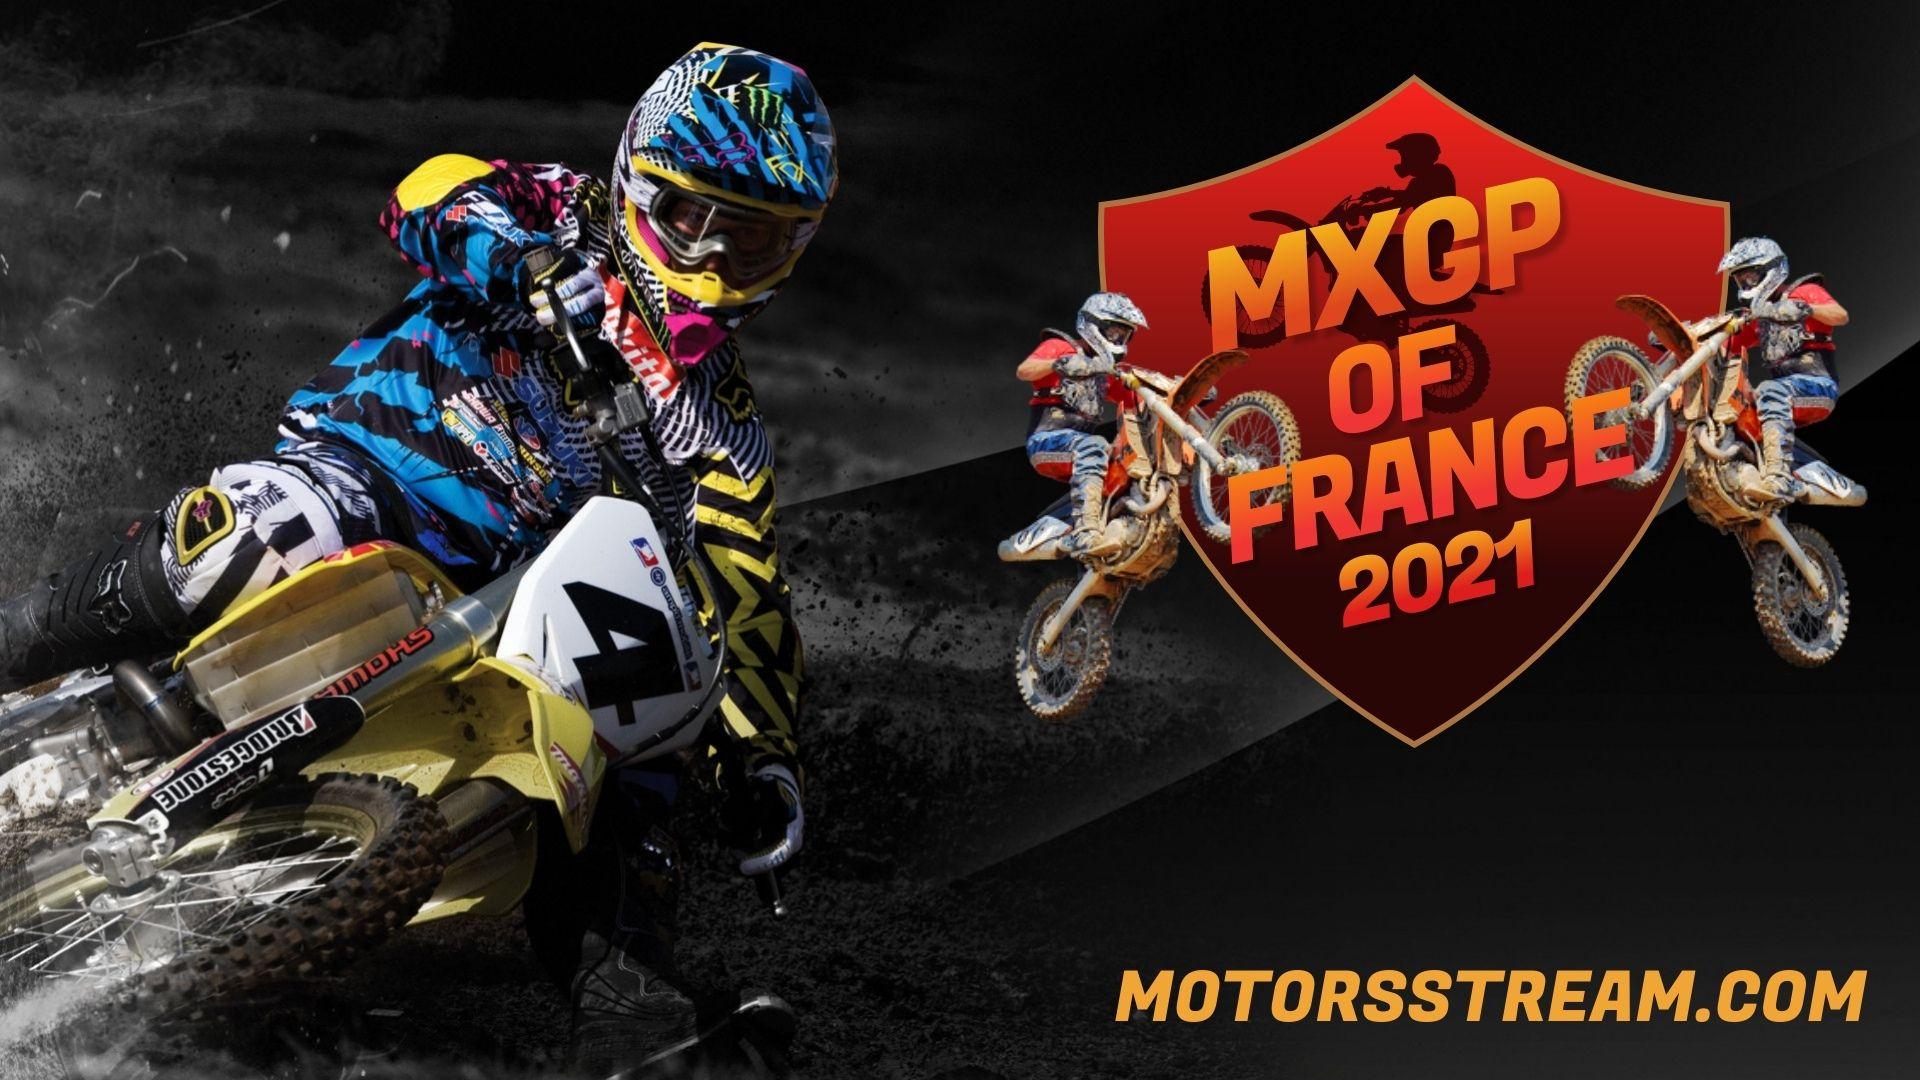 FIM Motocross WC France Live Stream 2021 | MXGP